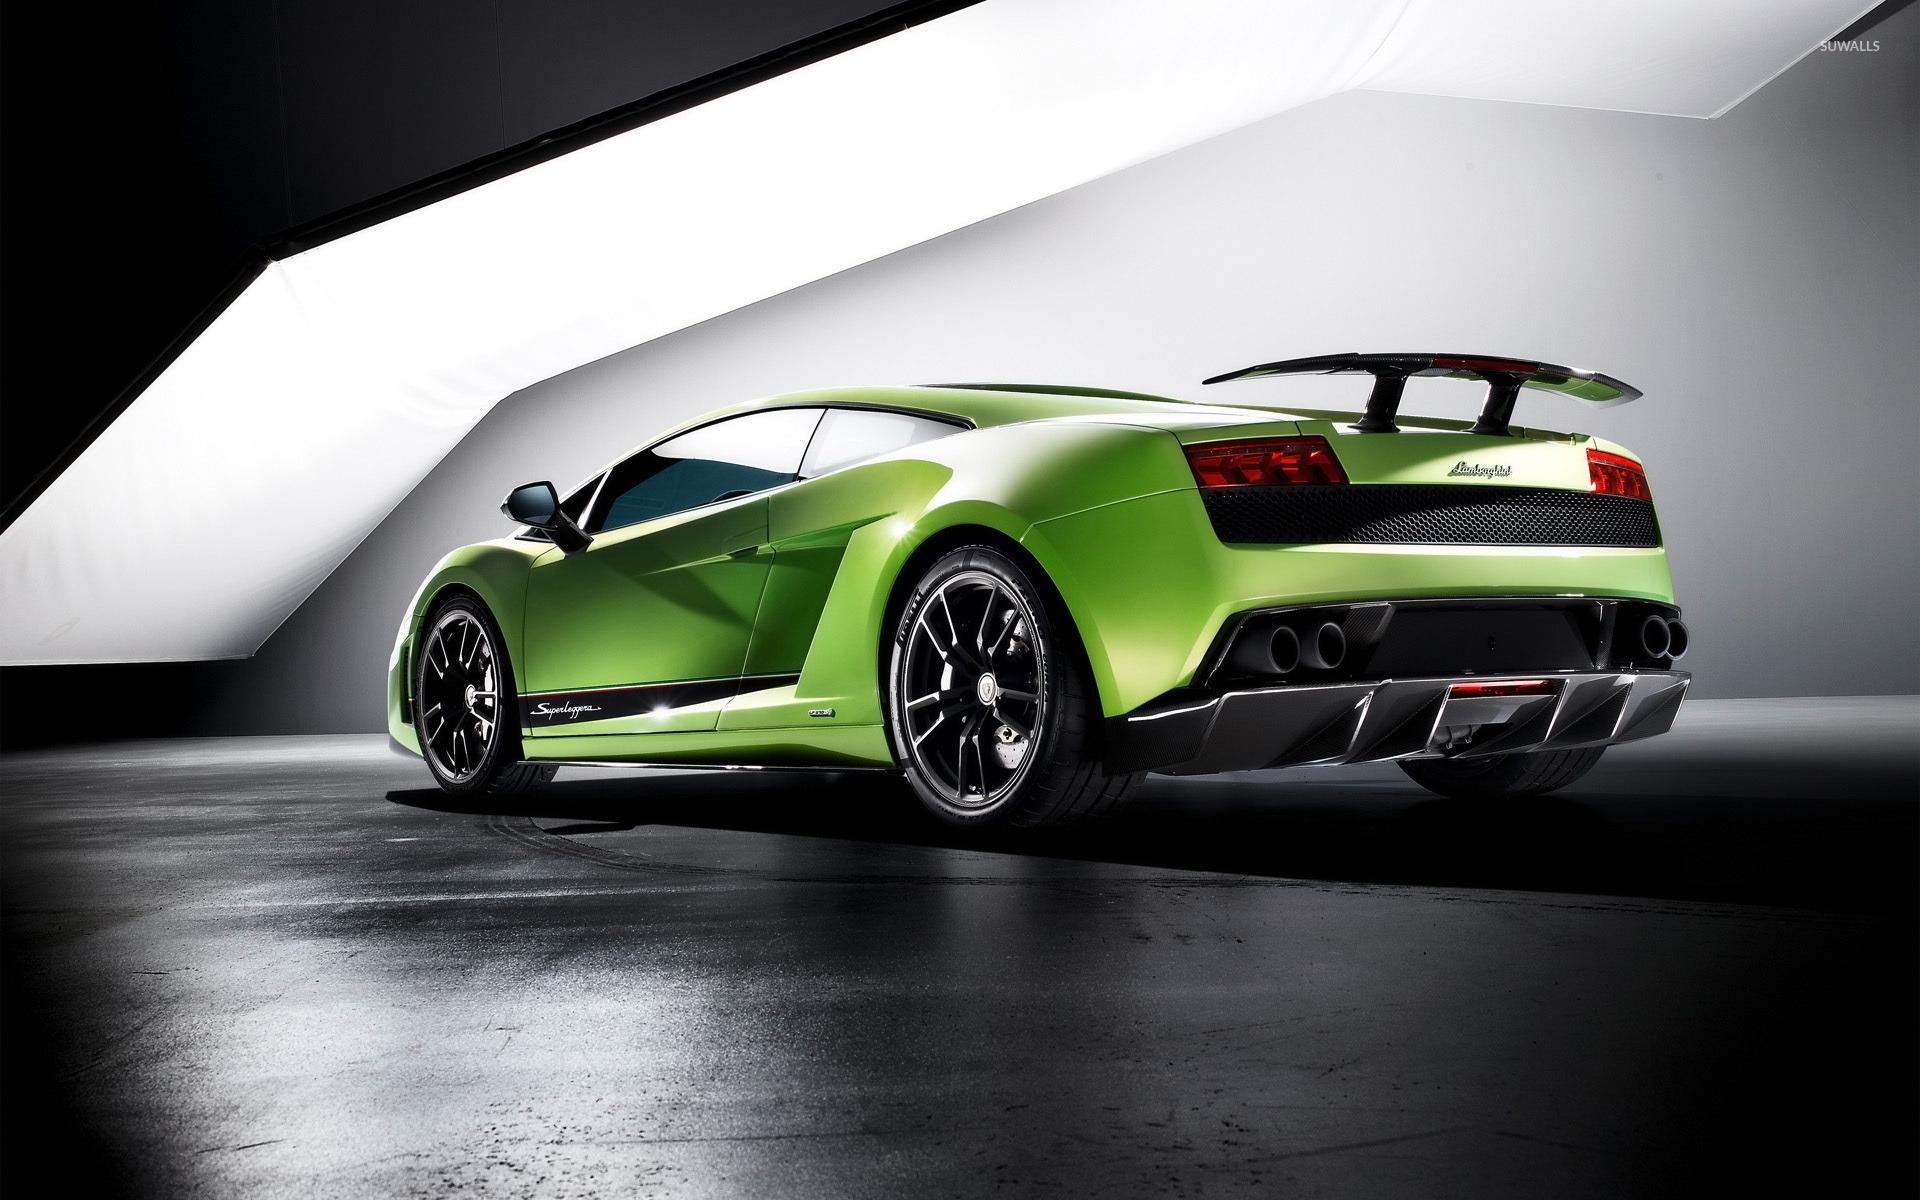 Side View Of A Green Lamborghini Gallardo Superleggera Wallpaper